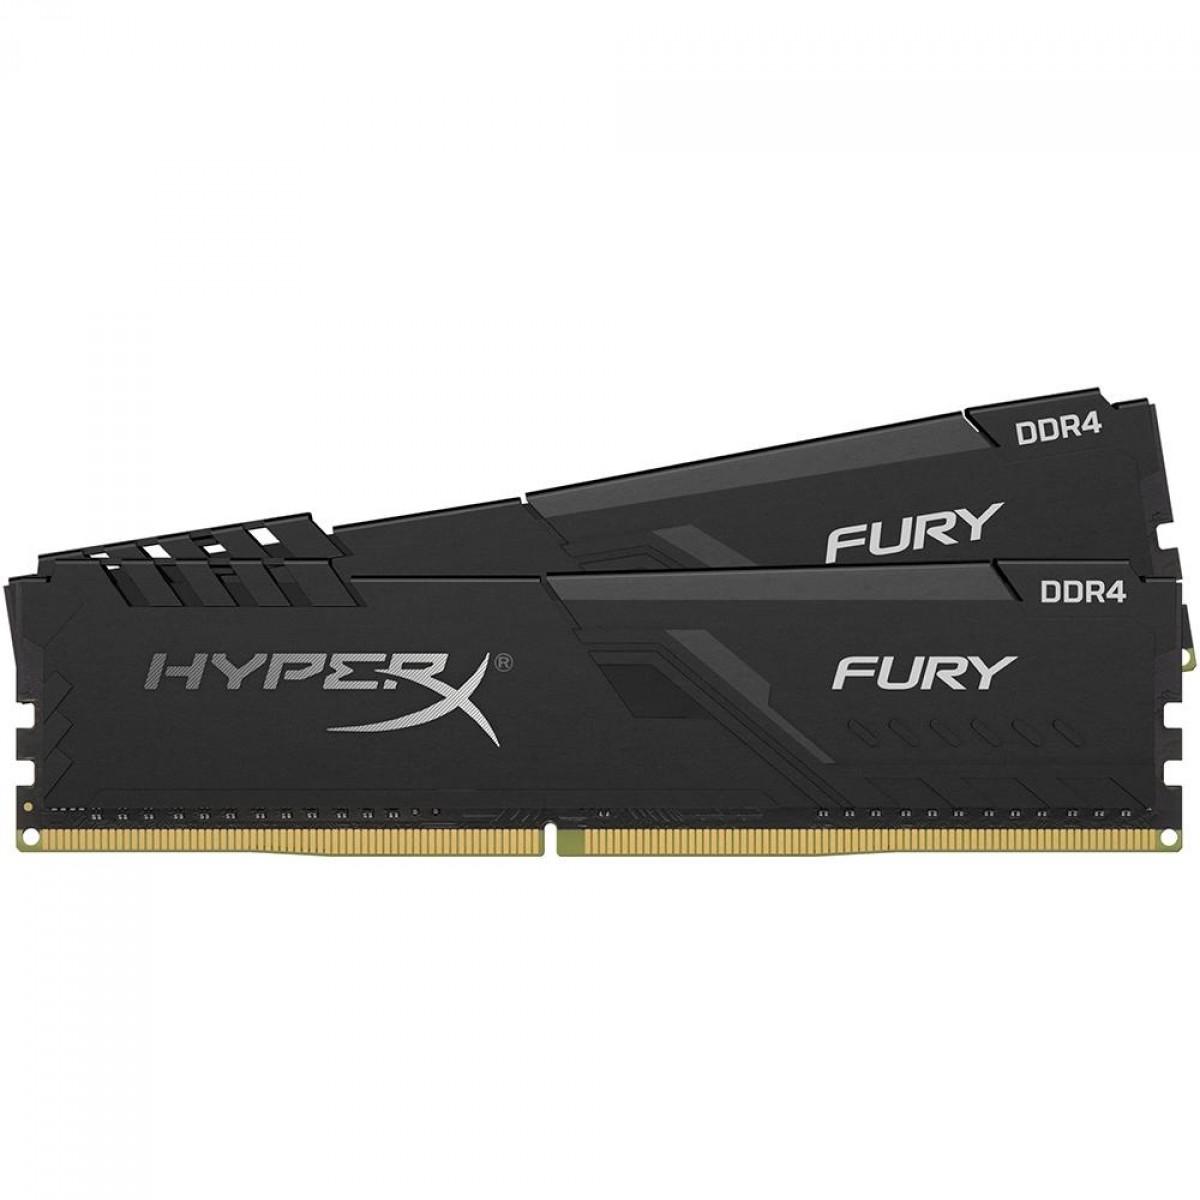 Memória DDR4 Kingston HyperX Fury, 8GB (2x4GB) 2666MHz, Black, HX426C16FB3/4 x 2